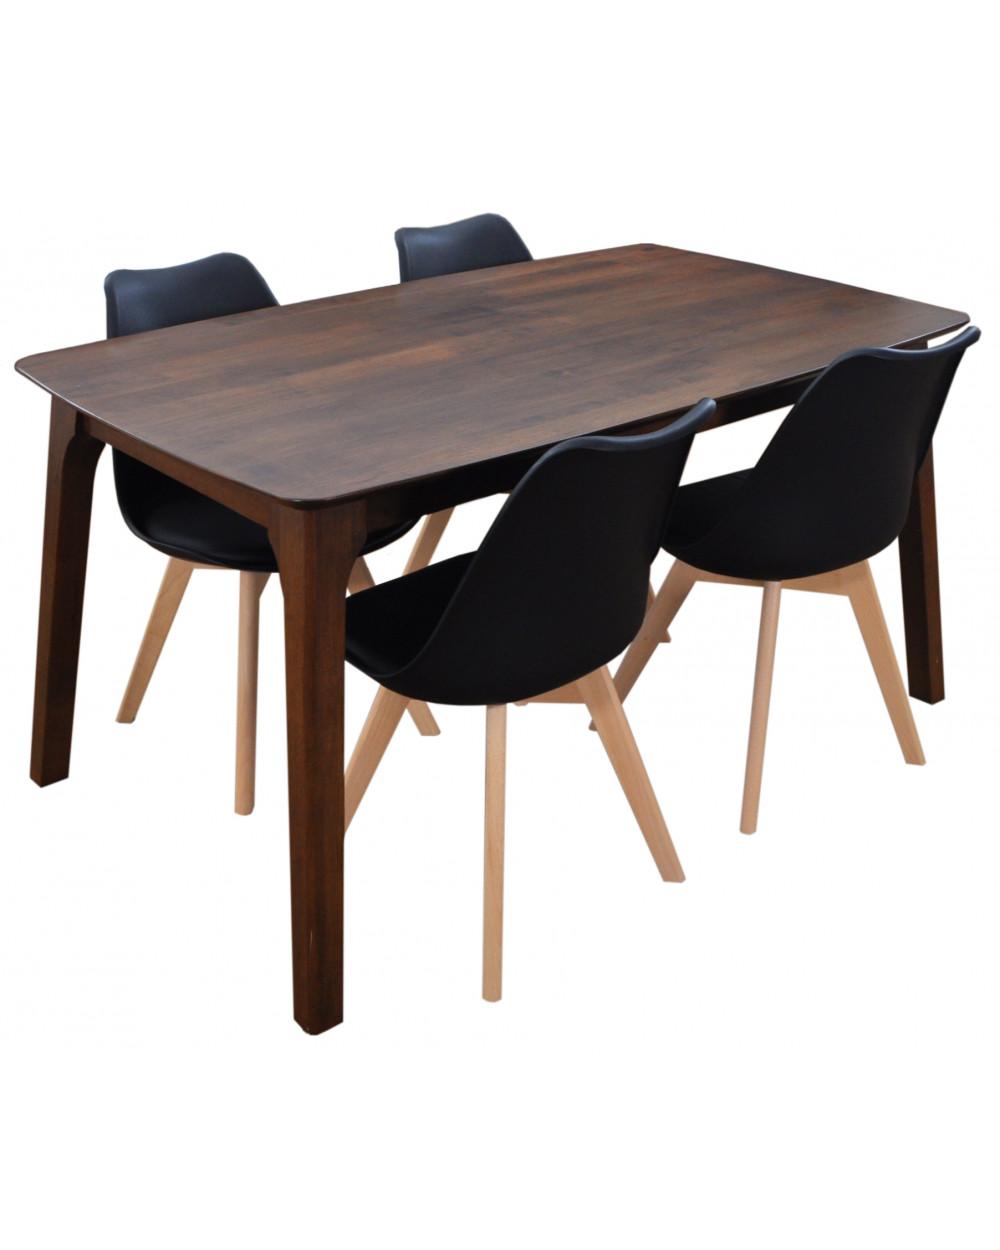 Rubberwood Walnut Dining Table